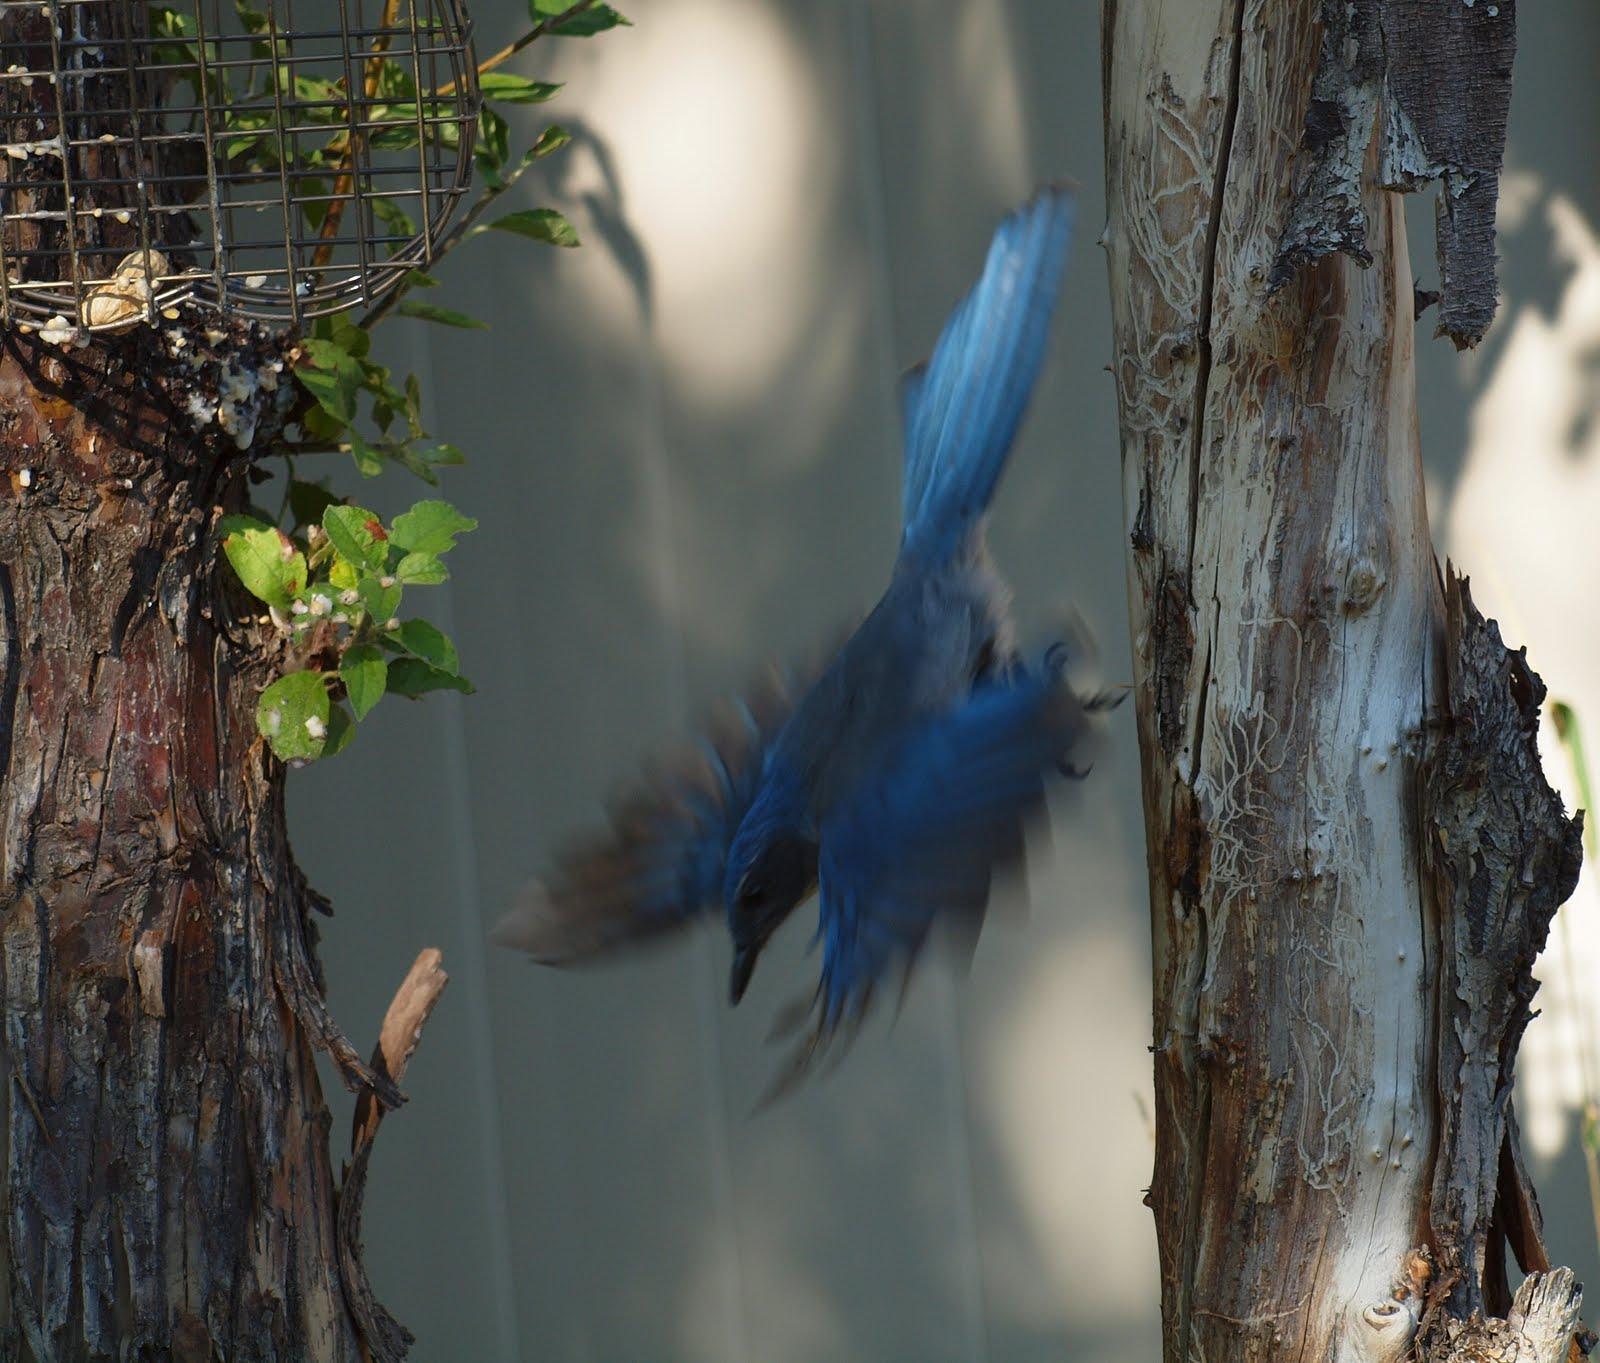 Birding Is Fun Backyard Scrubbies And Peanuts